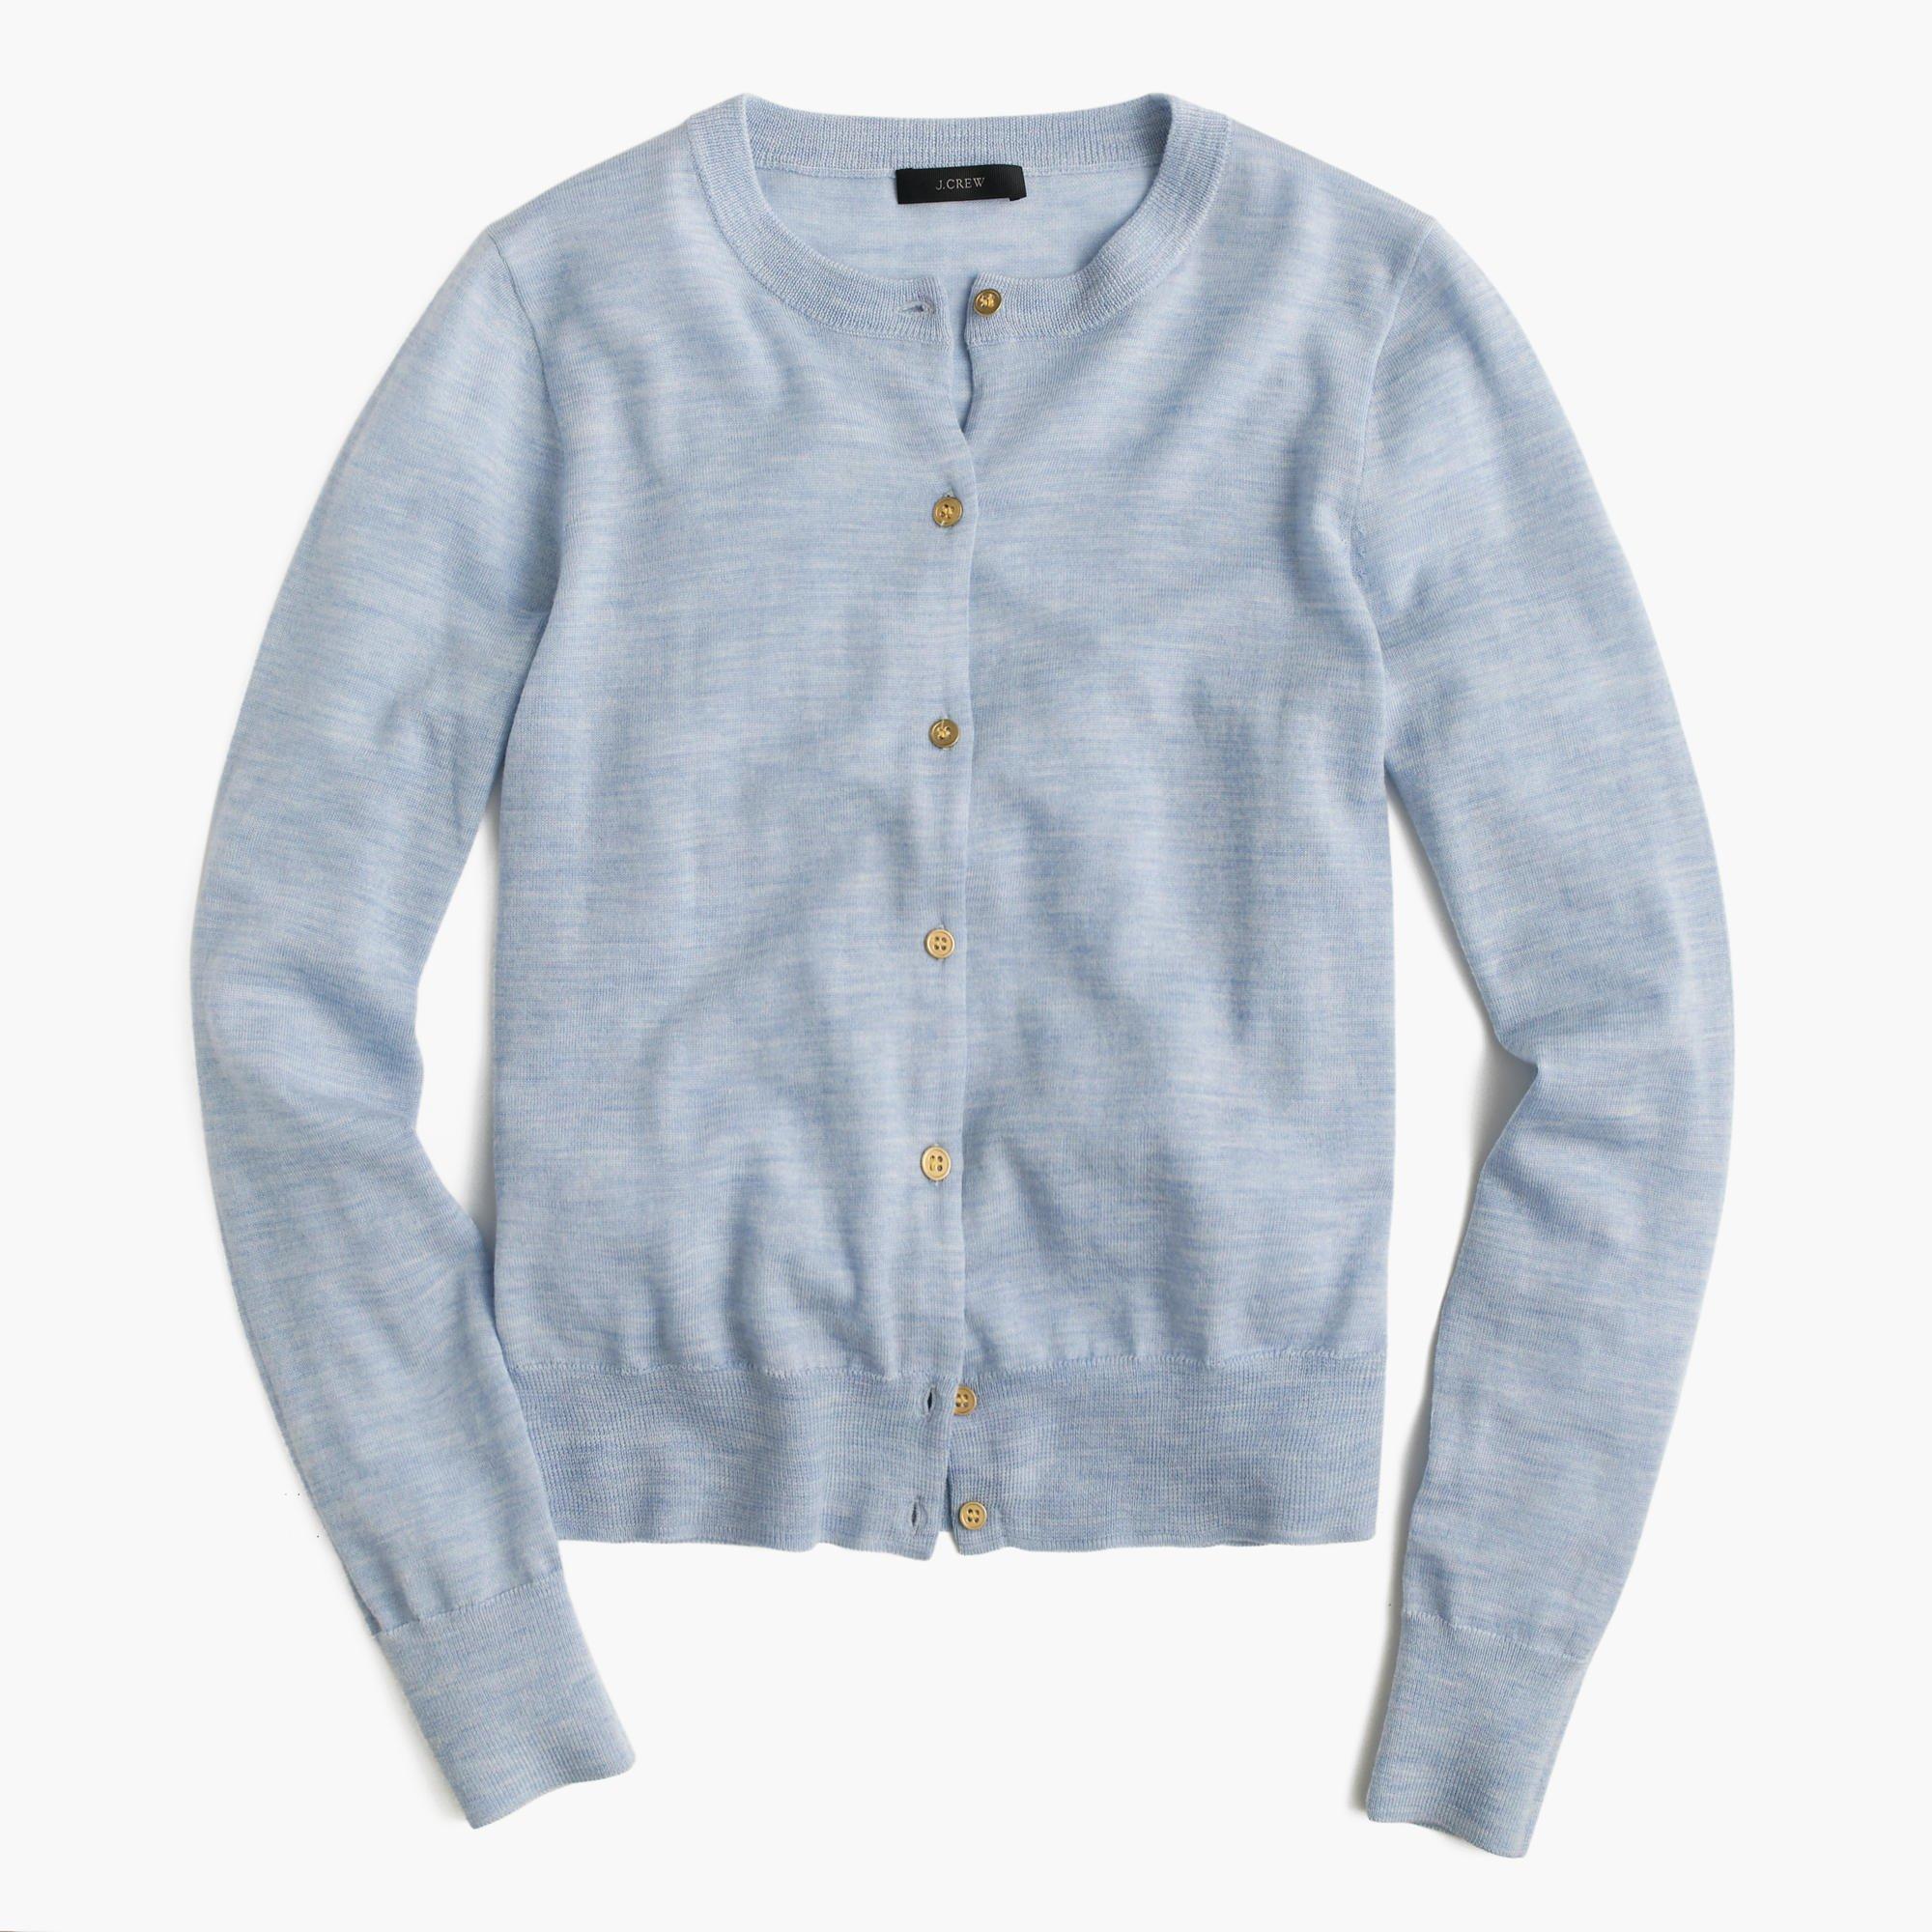 5581d04d69 Lyst - J.Crew Lightweight Wool Jackie Cardigan Sweater in Blue